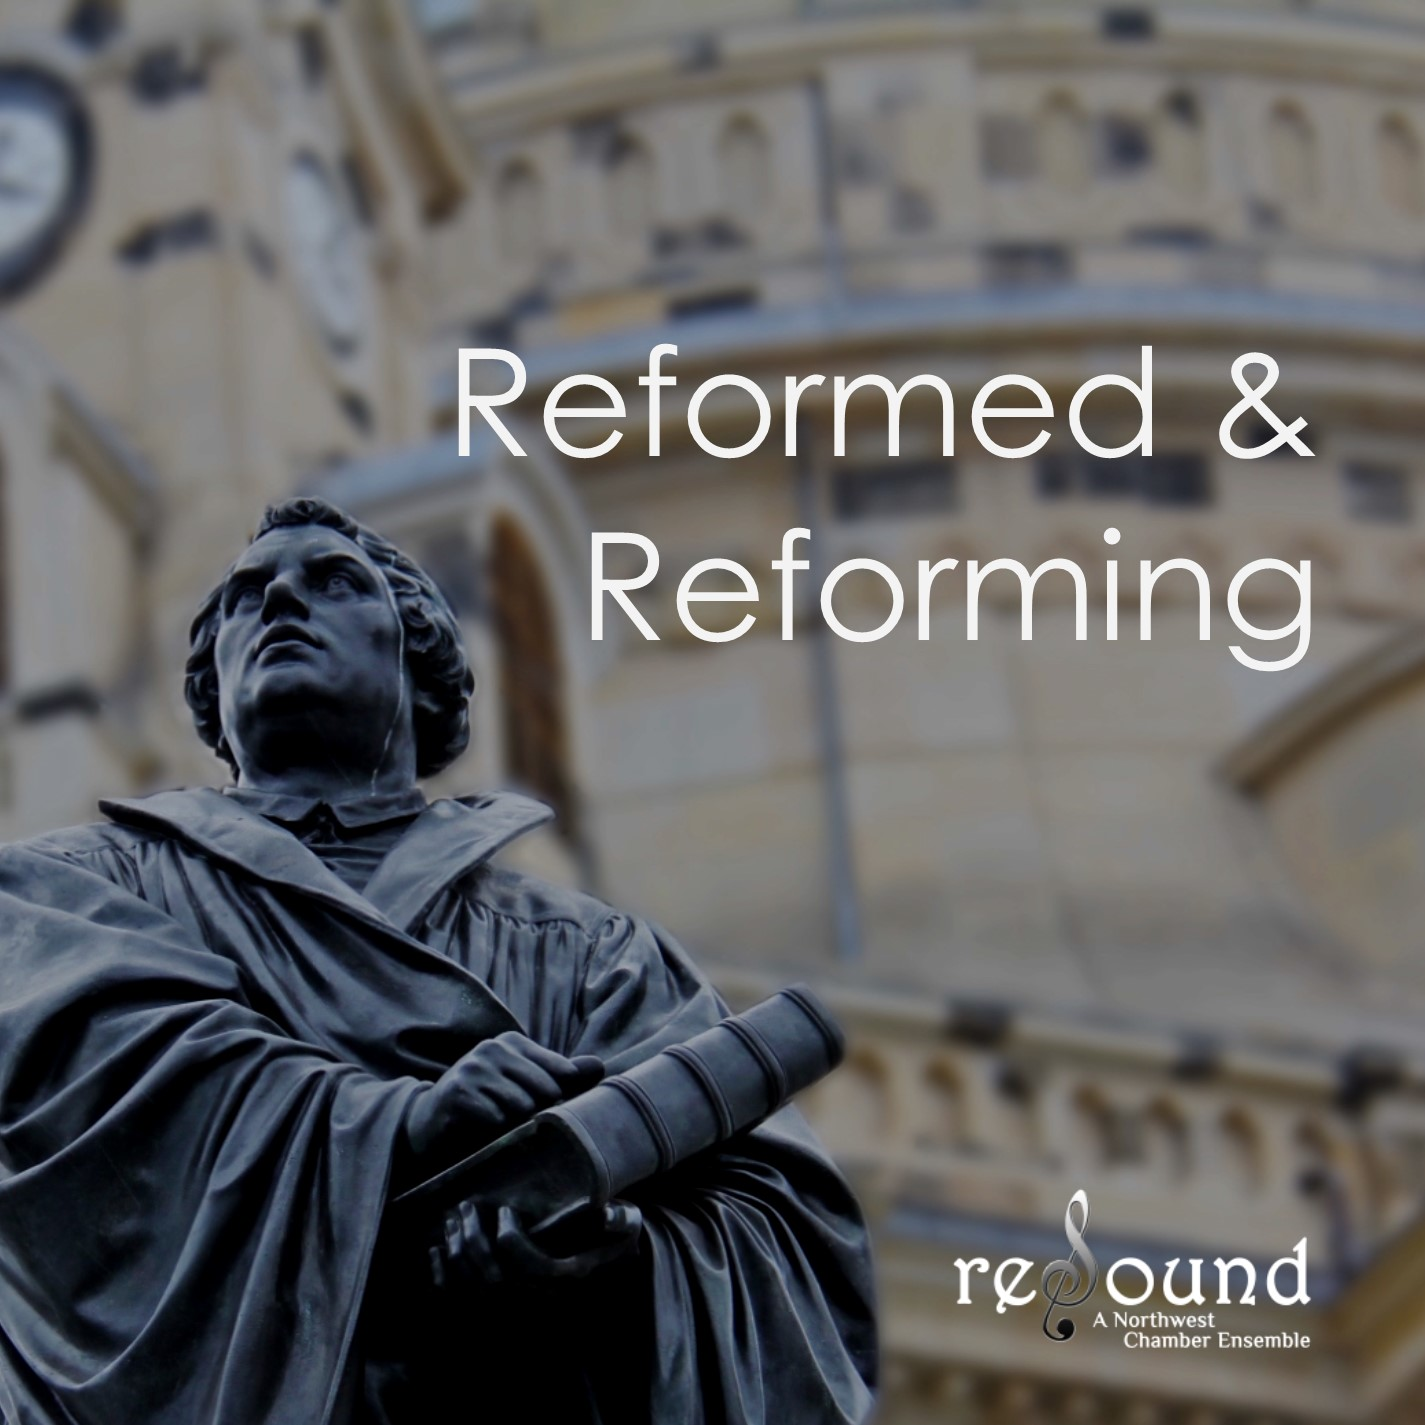 ReformedReformingCDcover.jpg